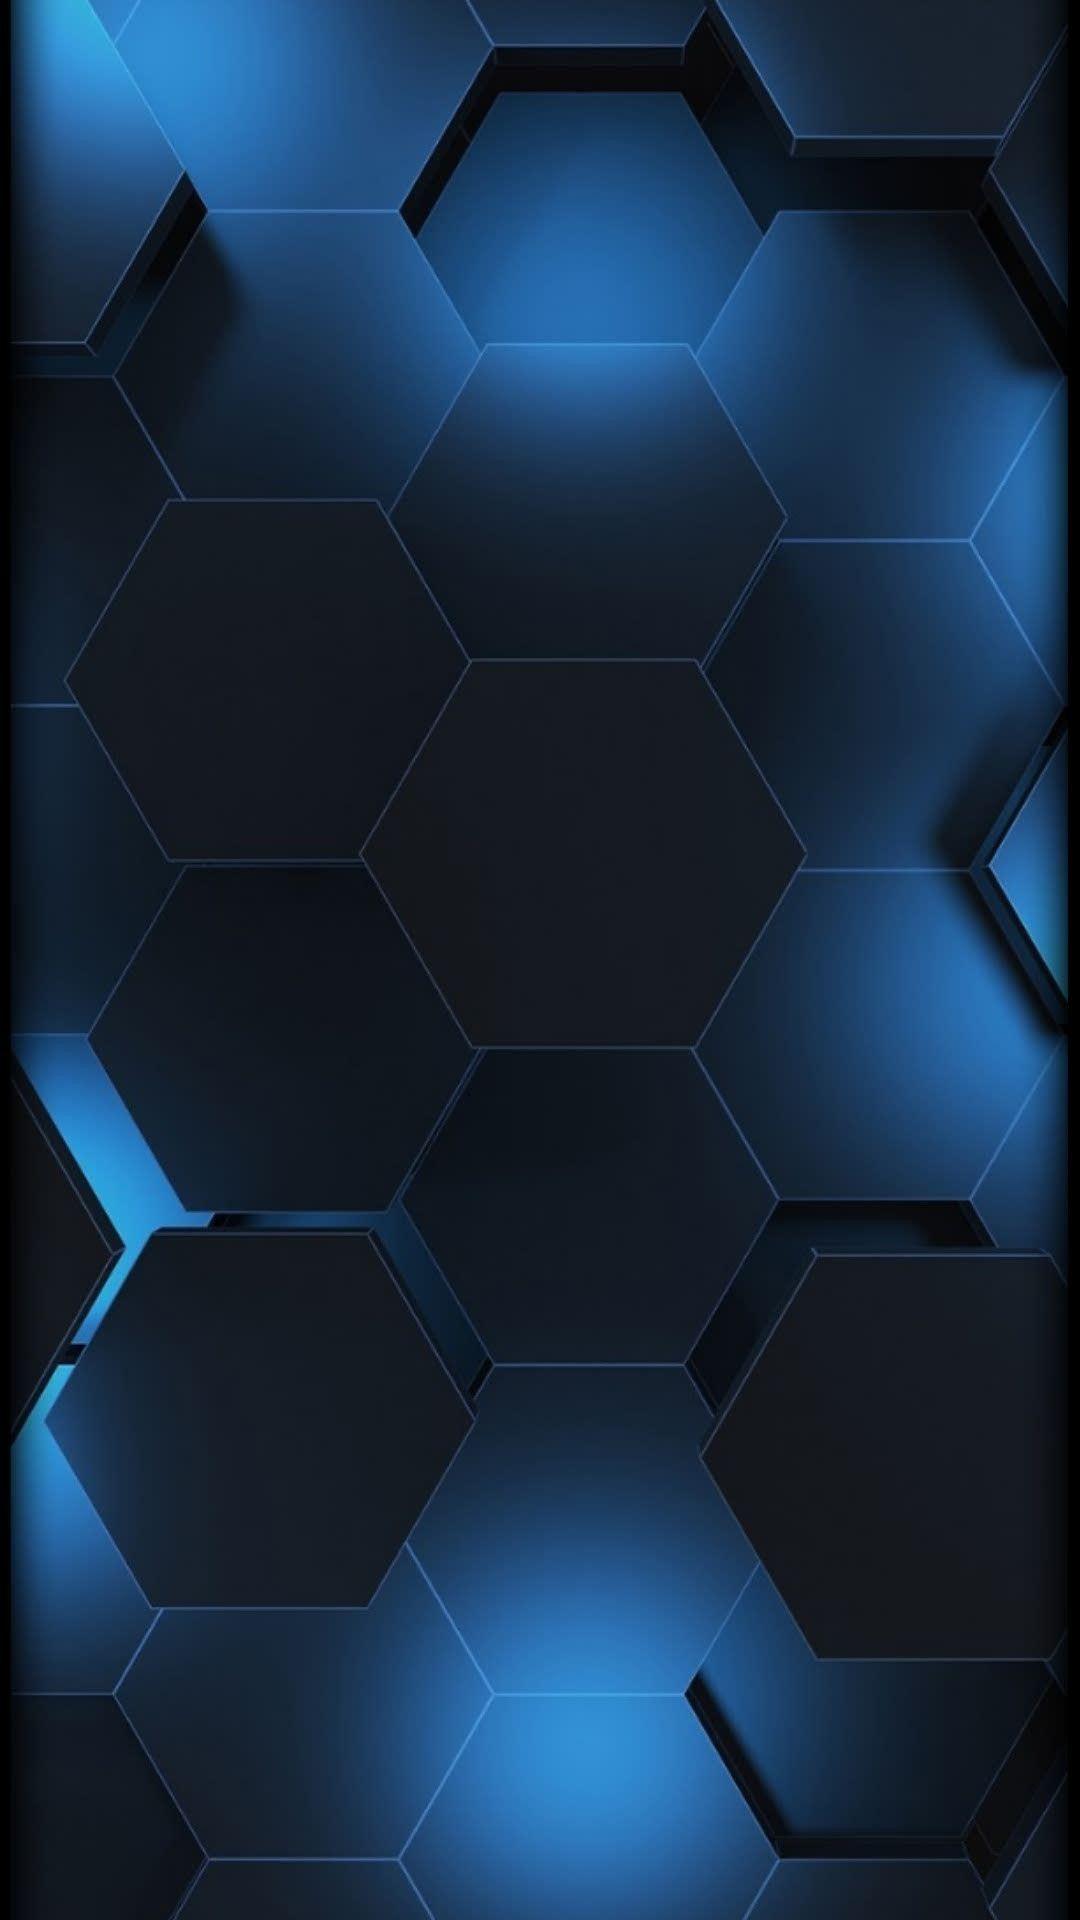 Honeycomb Dew Phone Wallpaper Design Black And Blue Wallpaper Cellphone Wallpaper